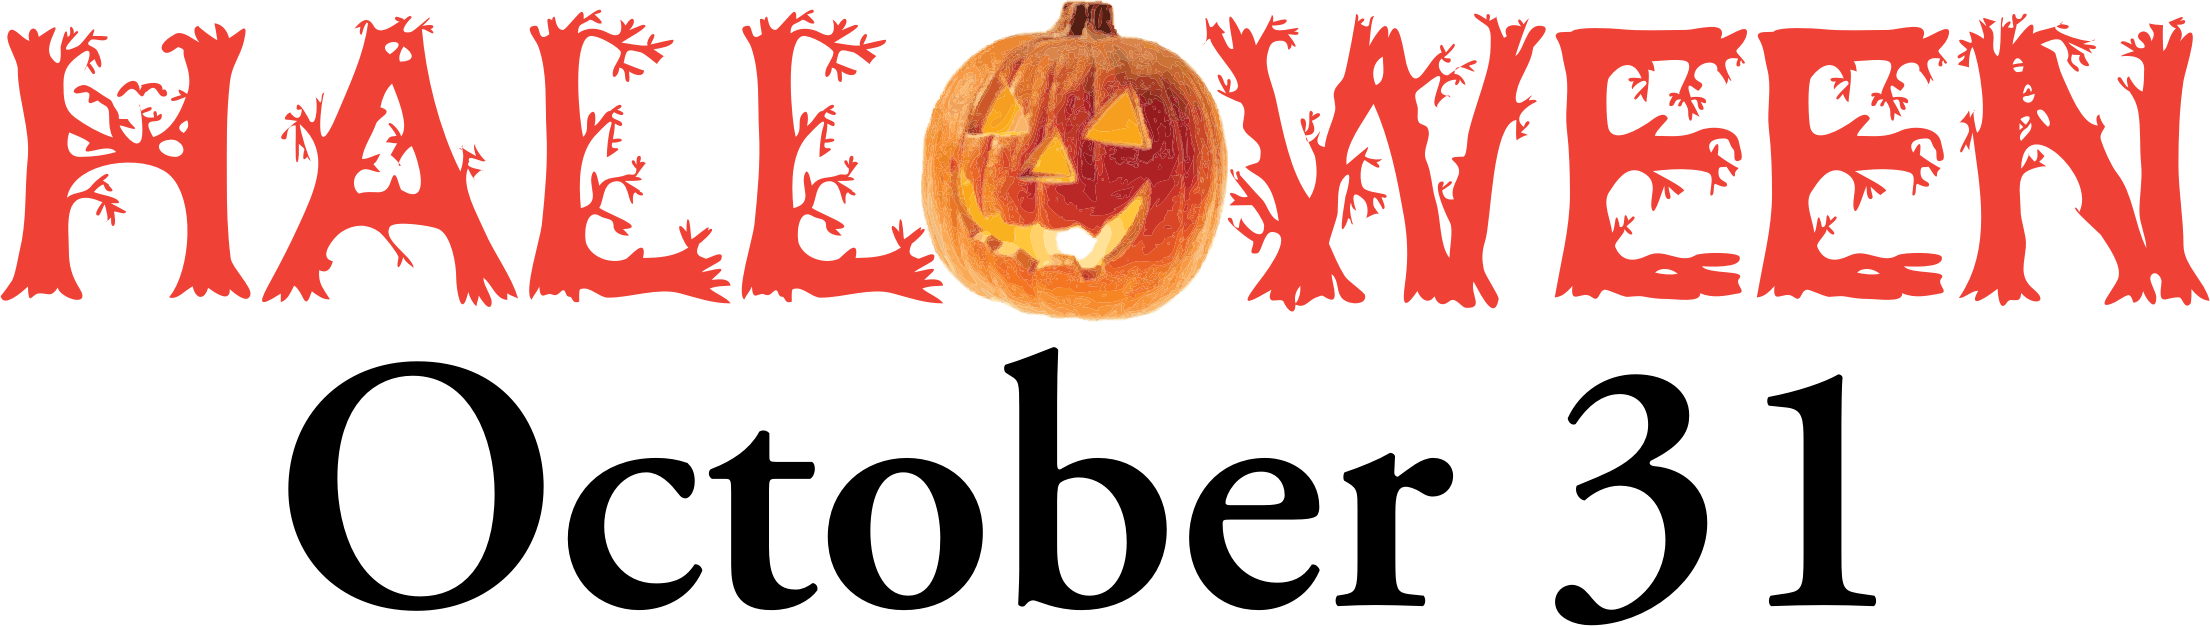 Halloween clipart banner clip art freeuse download Clipart - Halloween Banner clip art freeuse download